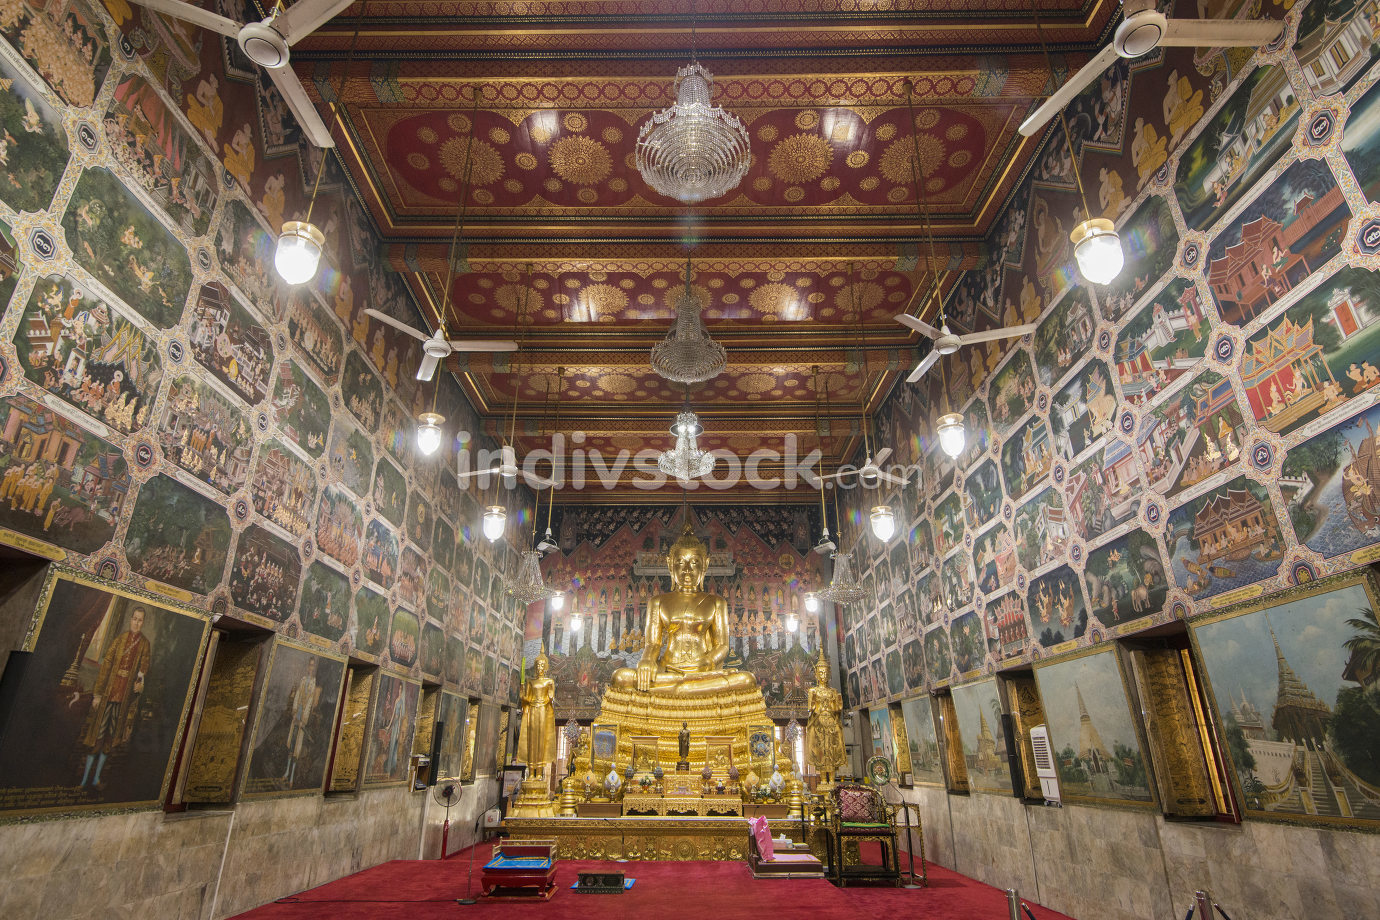 November, 2019 a Buddha at the Wat Pak Nam Temple in Thonburi near the city of Bangkok in Thailand